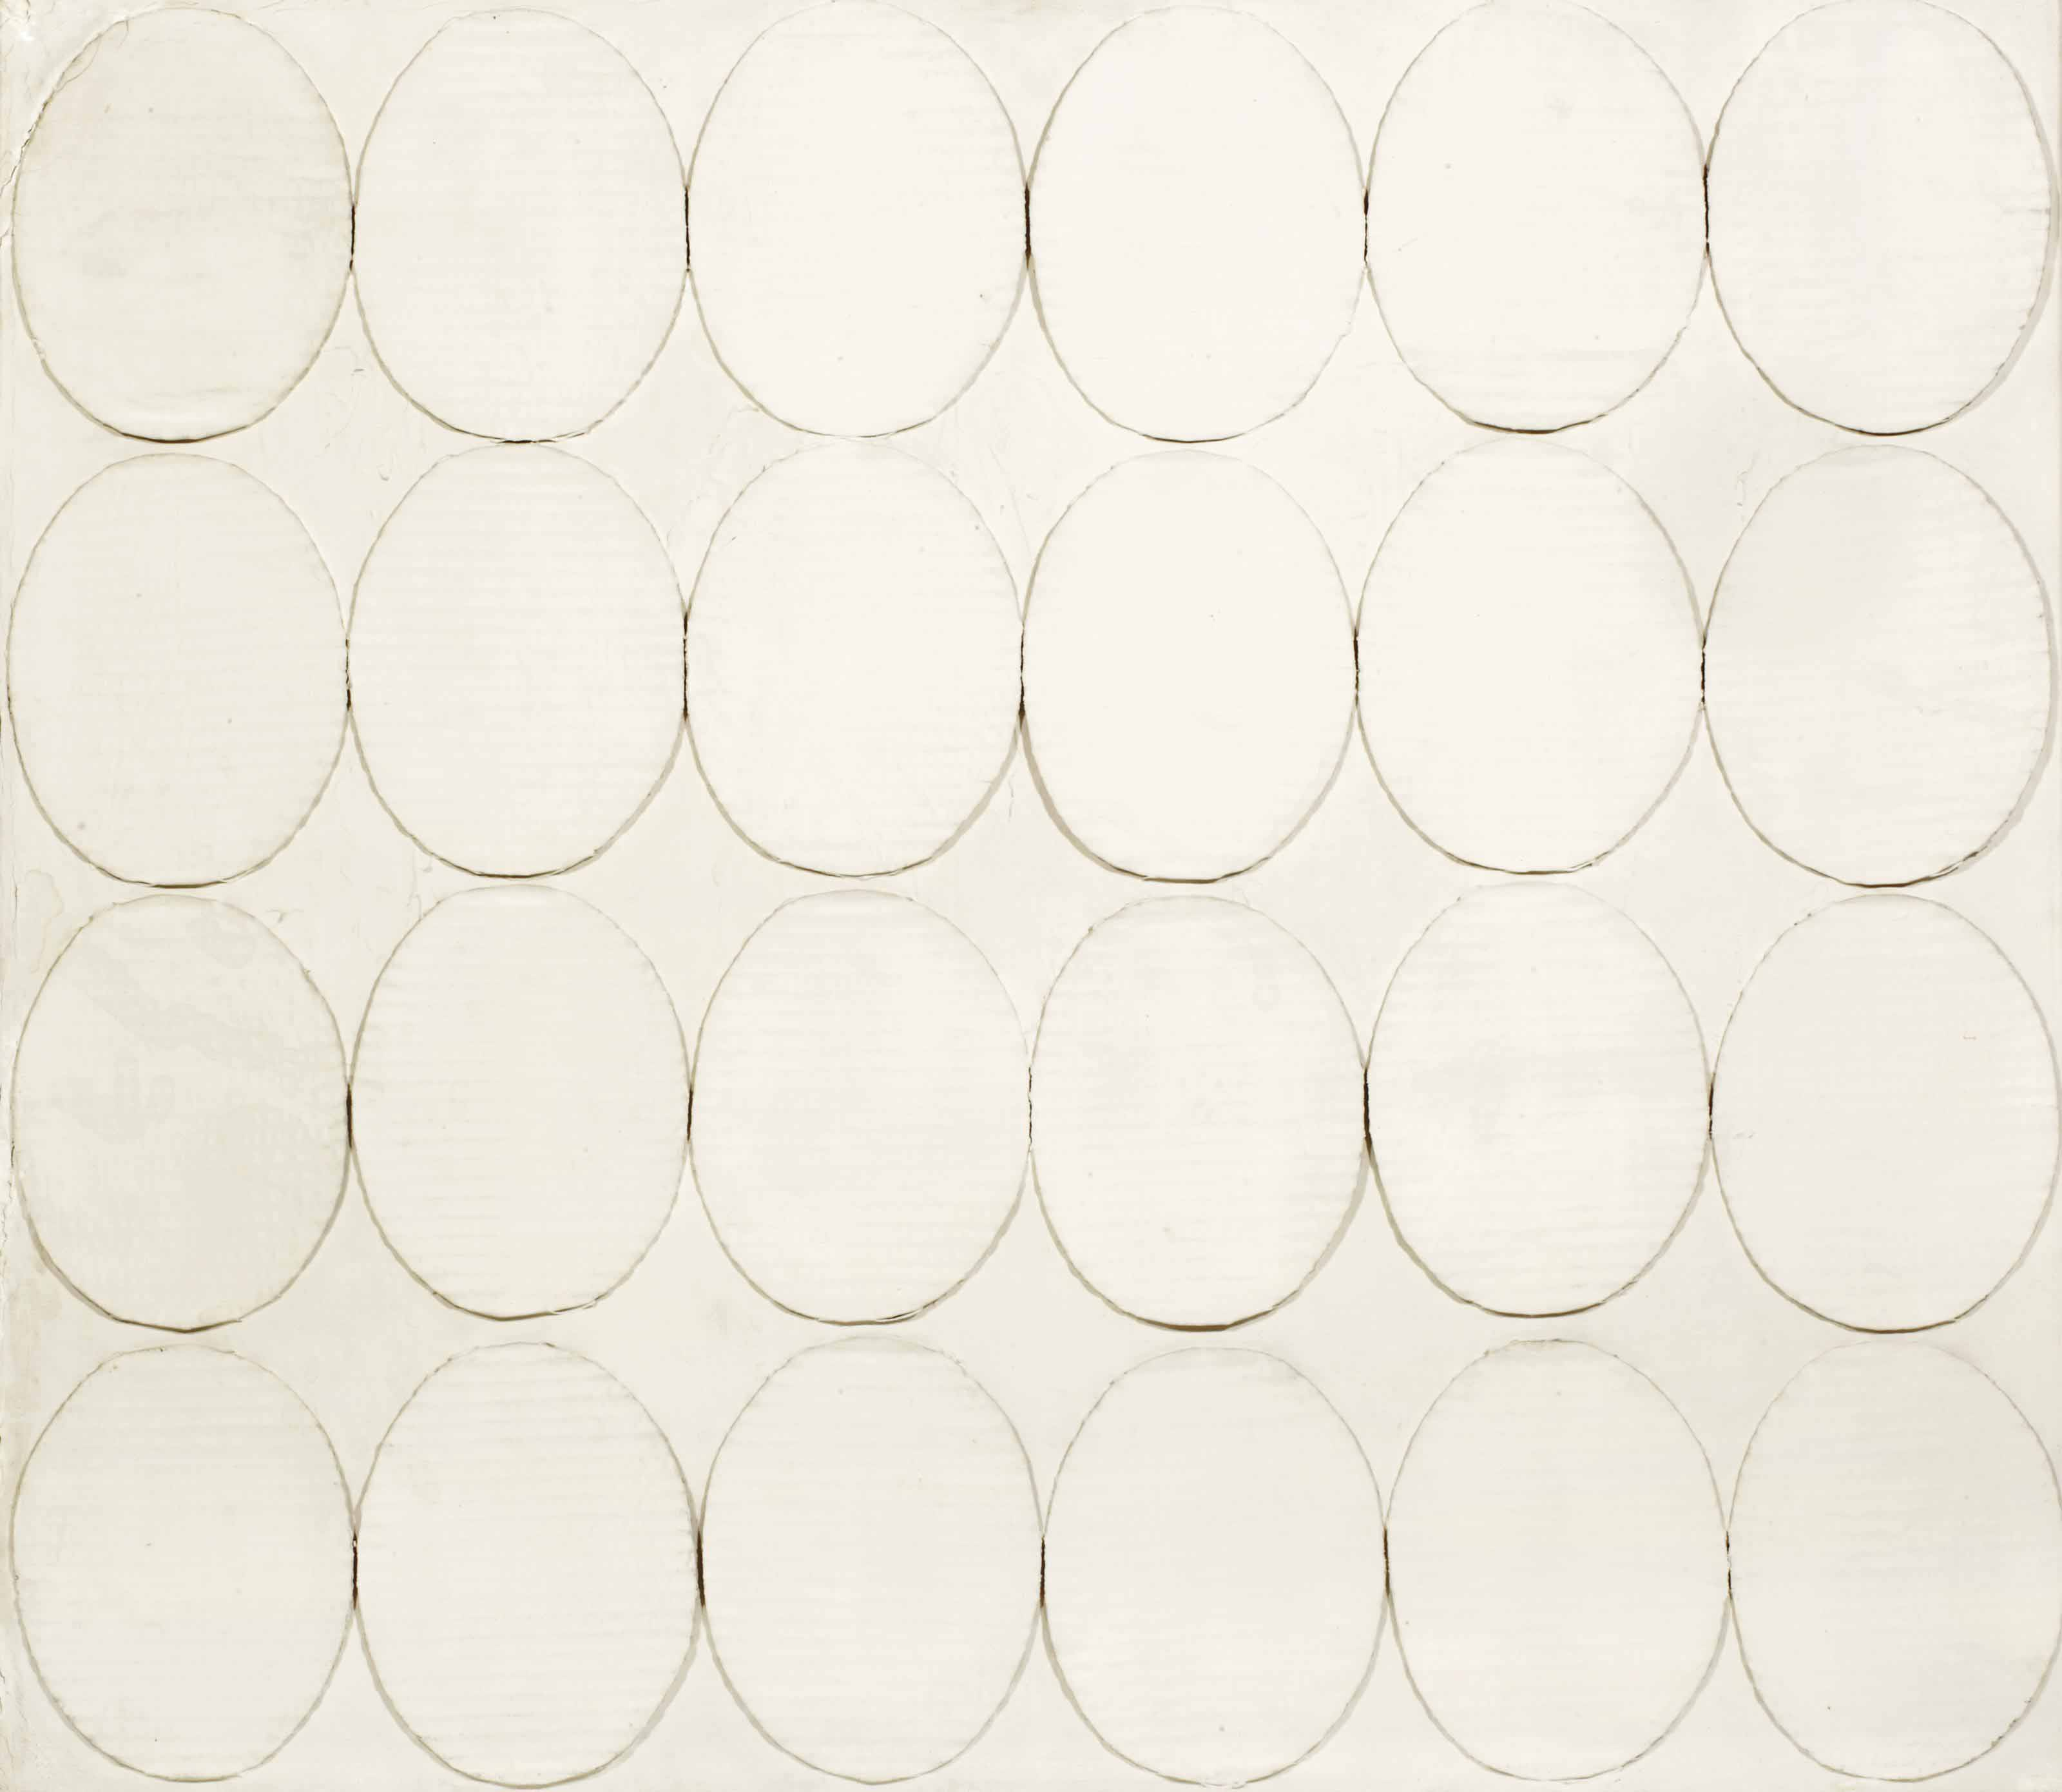 Untitled (ventiquattro ovali bianchi)